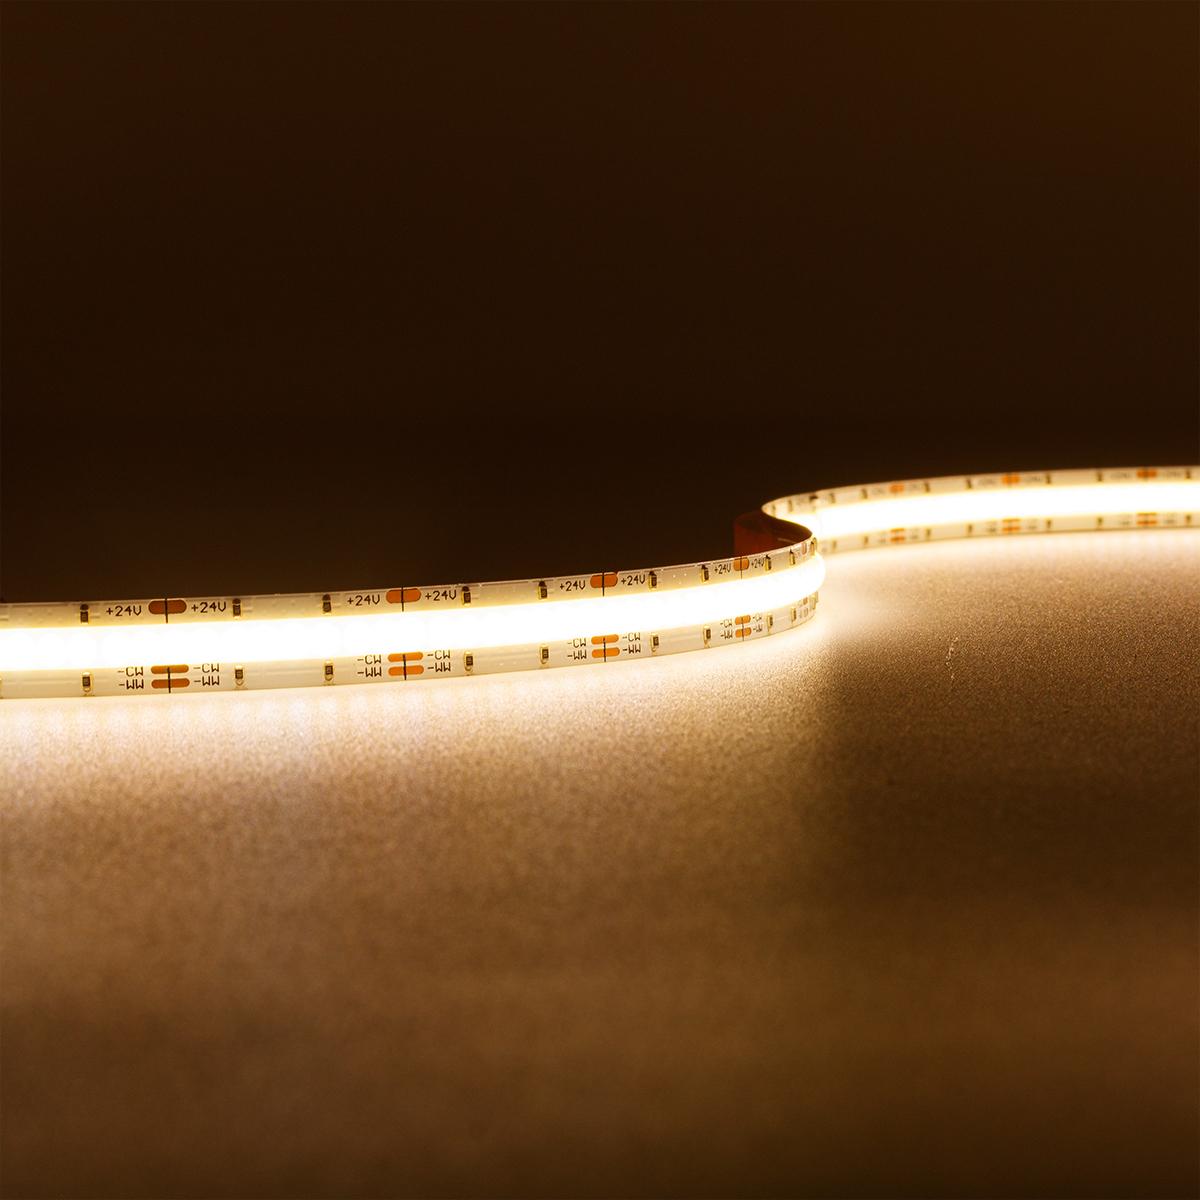 COB CCT Dual Weiß 24V LED Streifen 5M 8W/m 640LED/m 10mm IP20 Lichtfarbe einstellbar Warm-Kaltweiß 2700-6500K